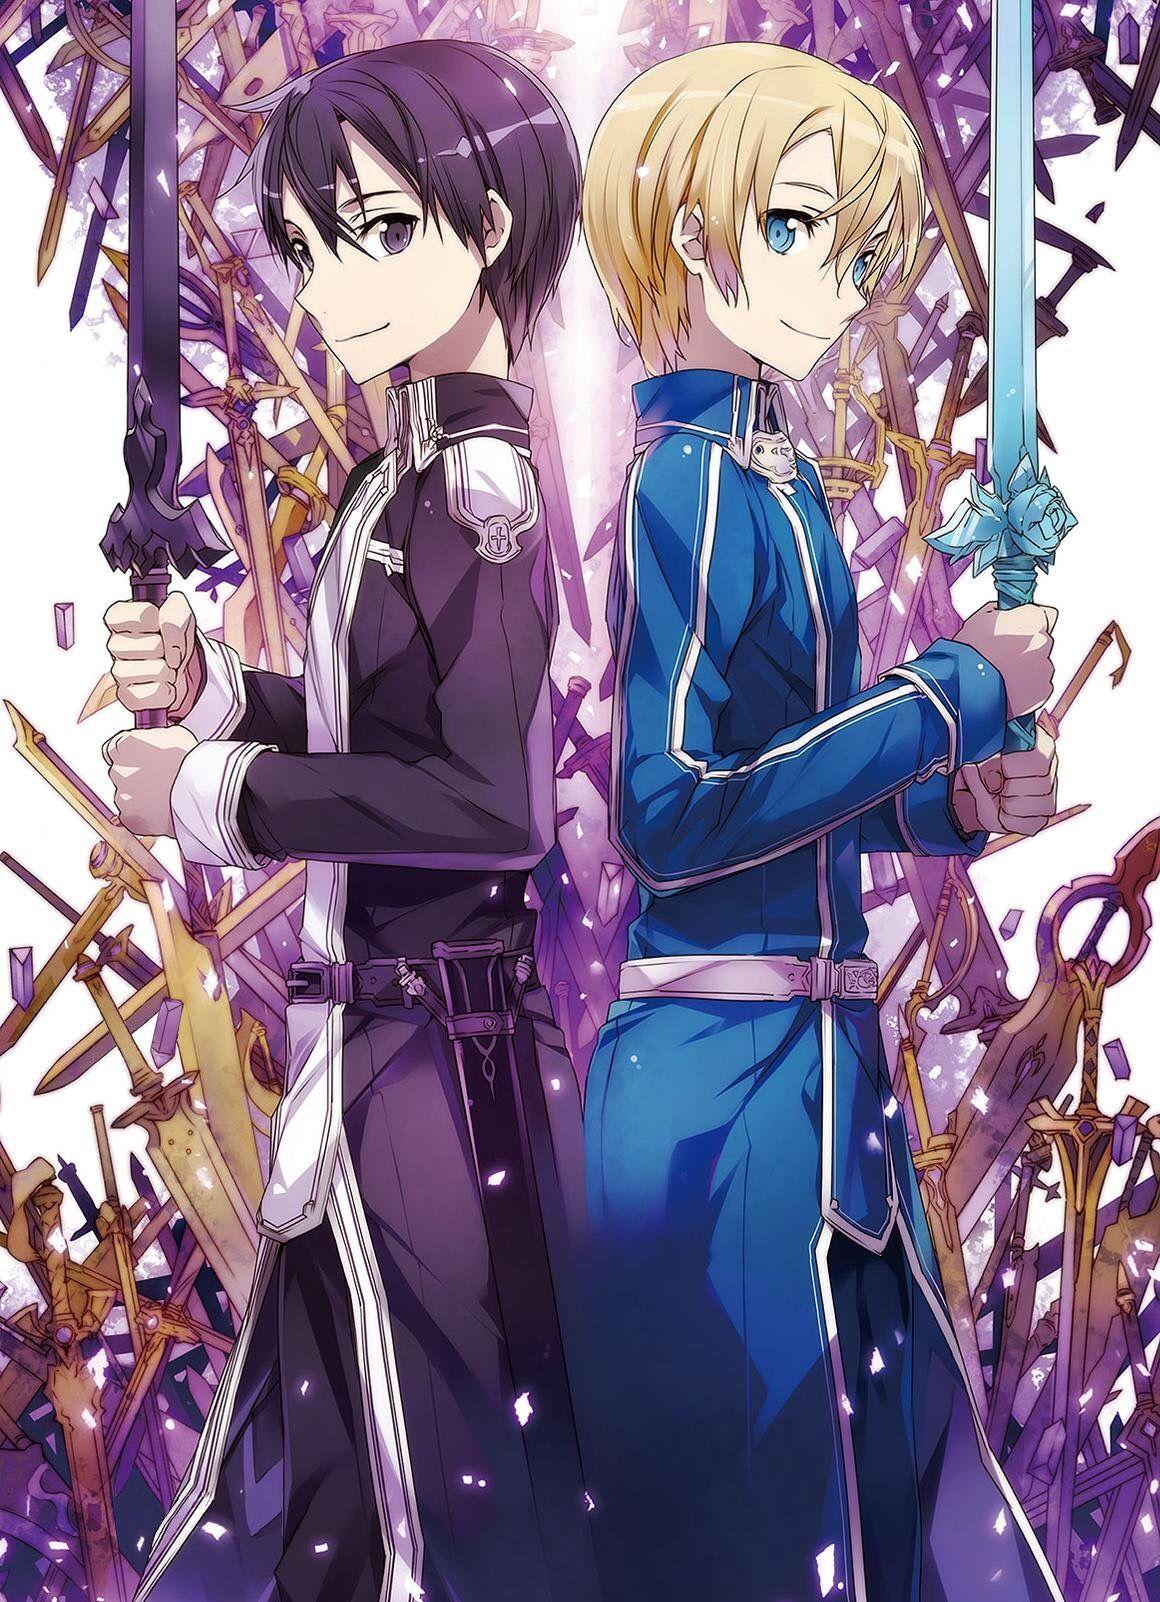 Sao Season 3 Alicization Promotional Poster Sao Swordartonline Alicization Kirito Anime Season3 Art Sword Arte De Espada Producao De Arte Arte Anime